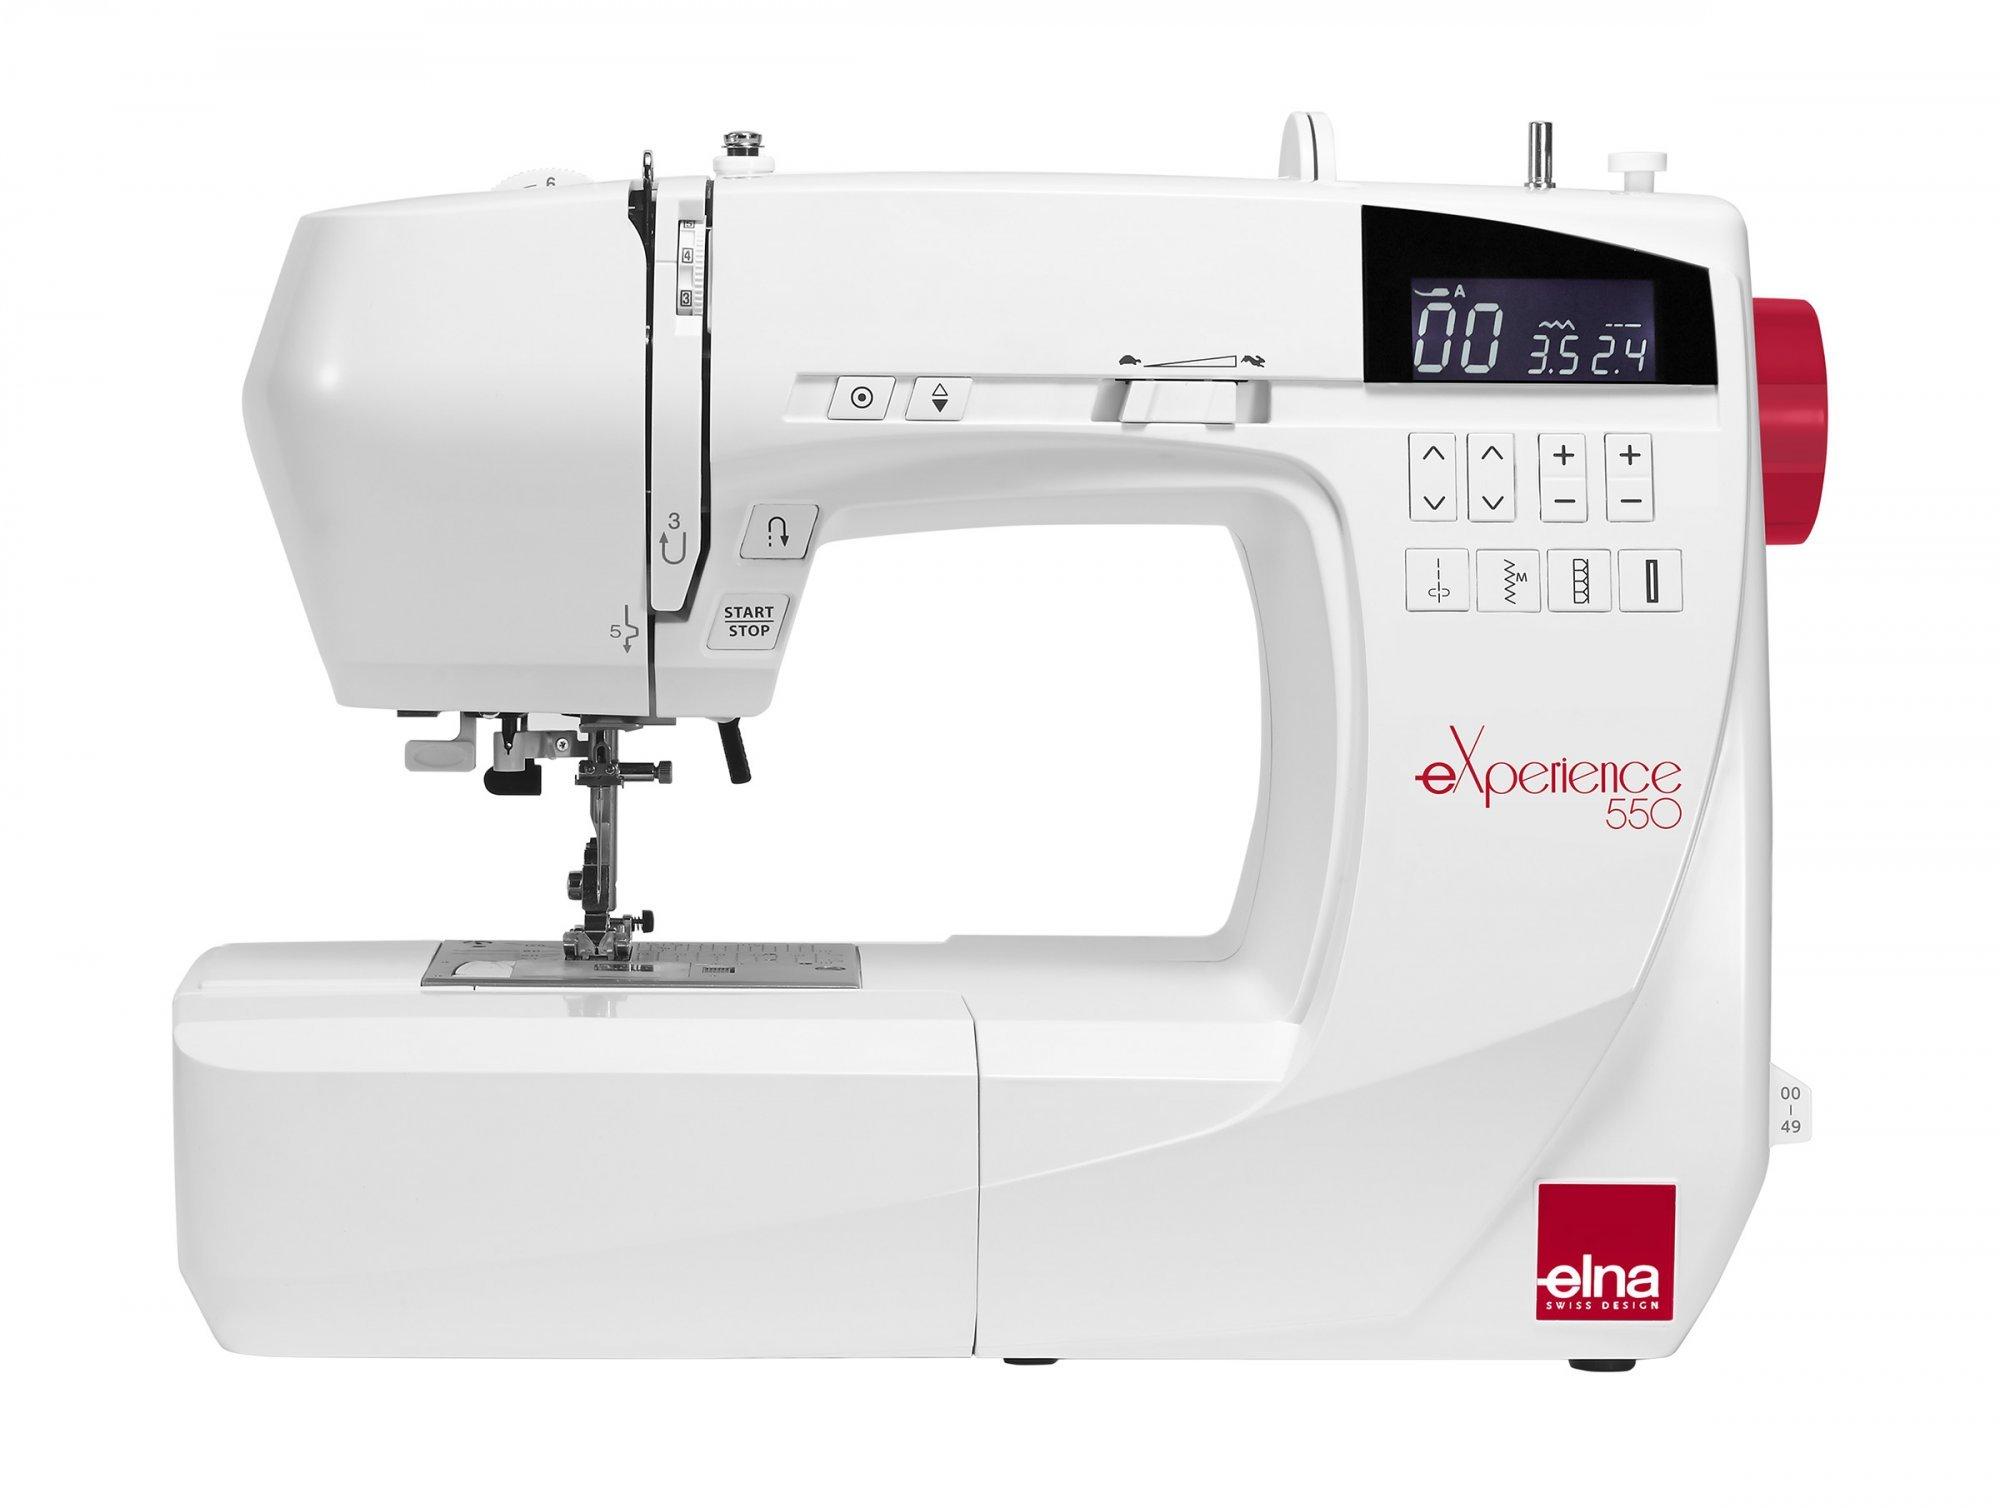 Elna eXperience 550-C Sewing Machine with Bonus Quilt Kit